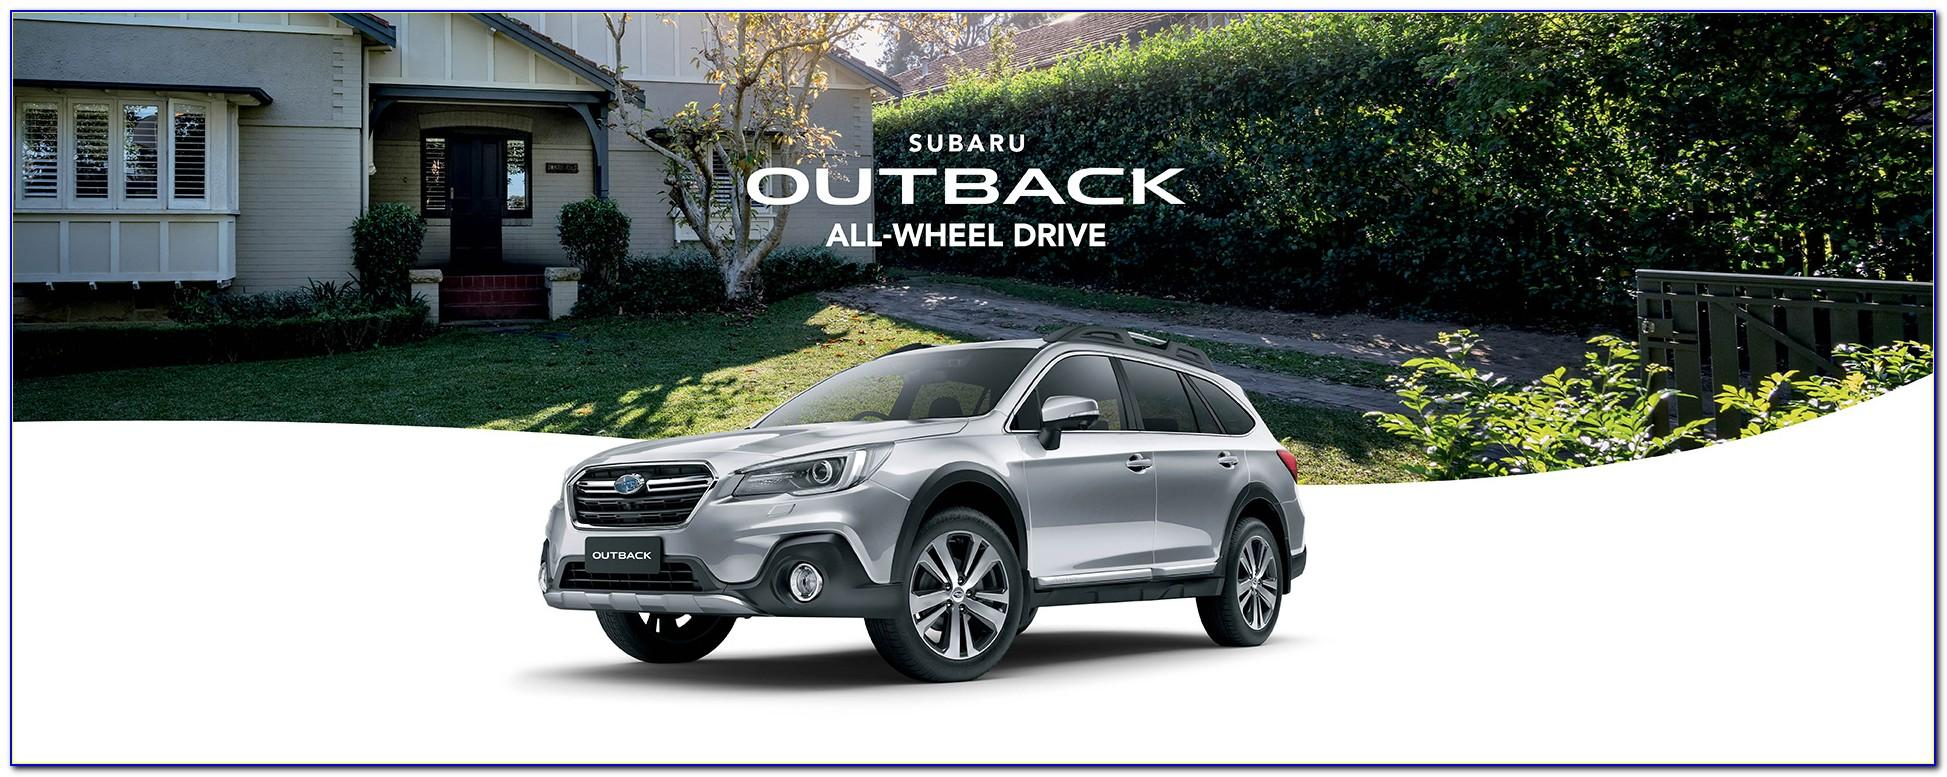 Subaru Outback Brochure 2017